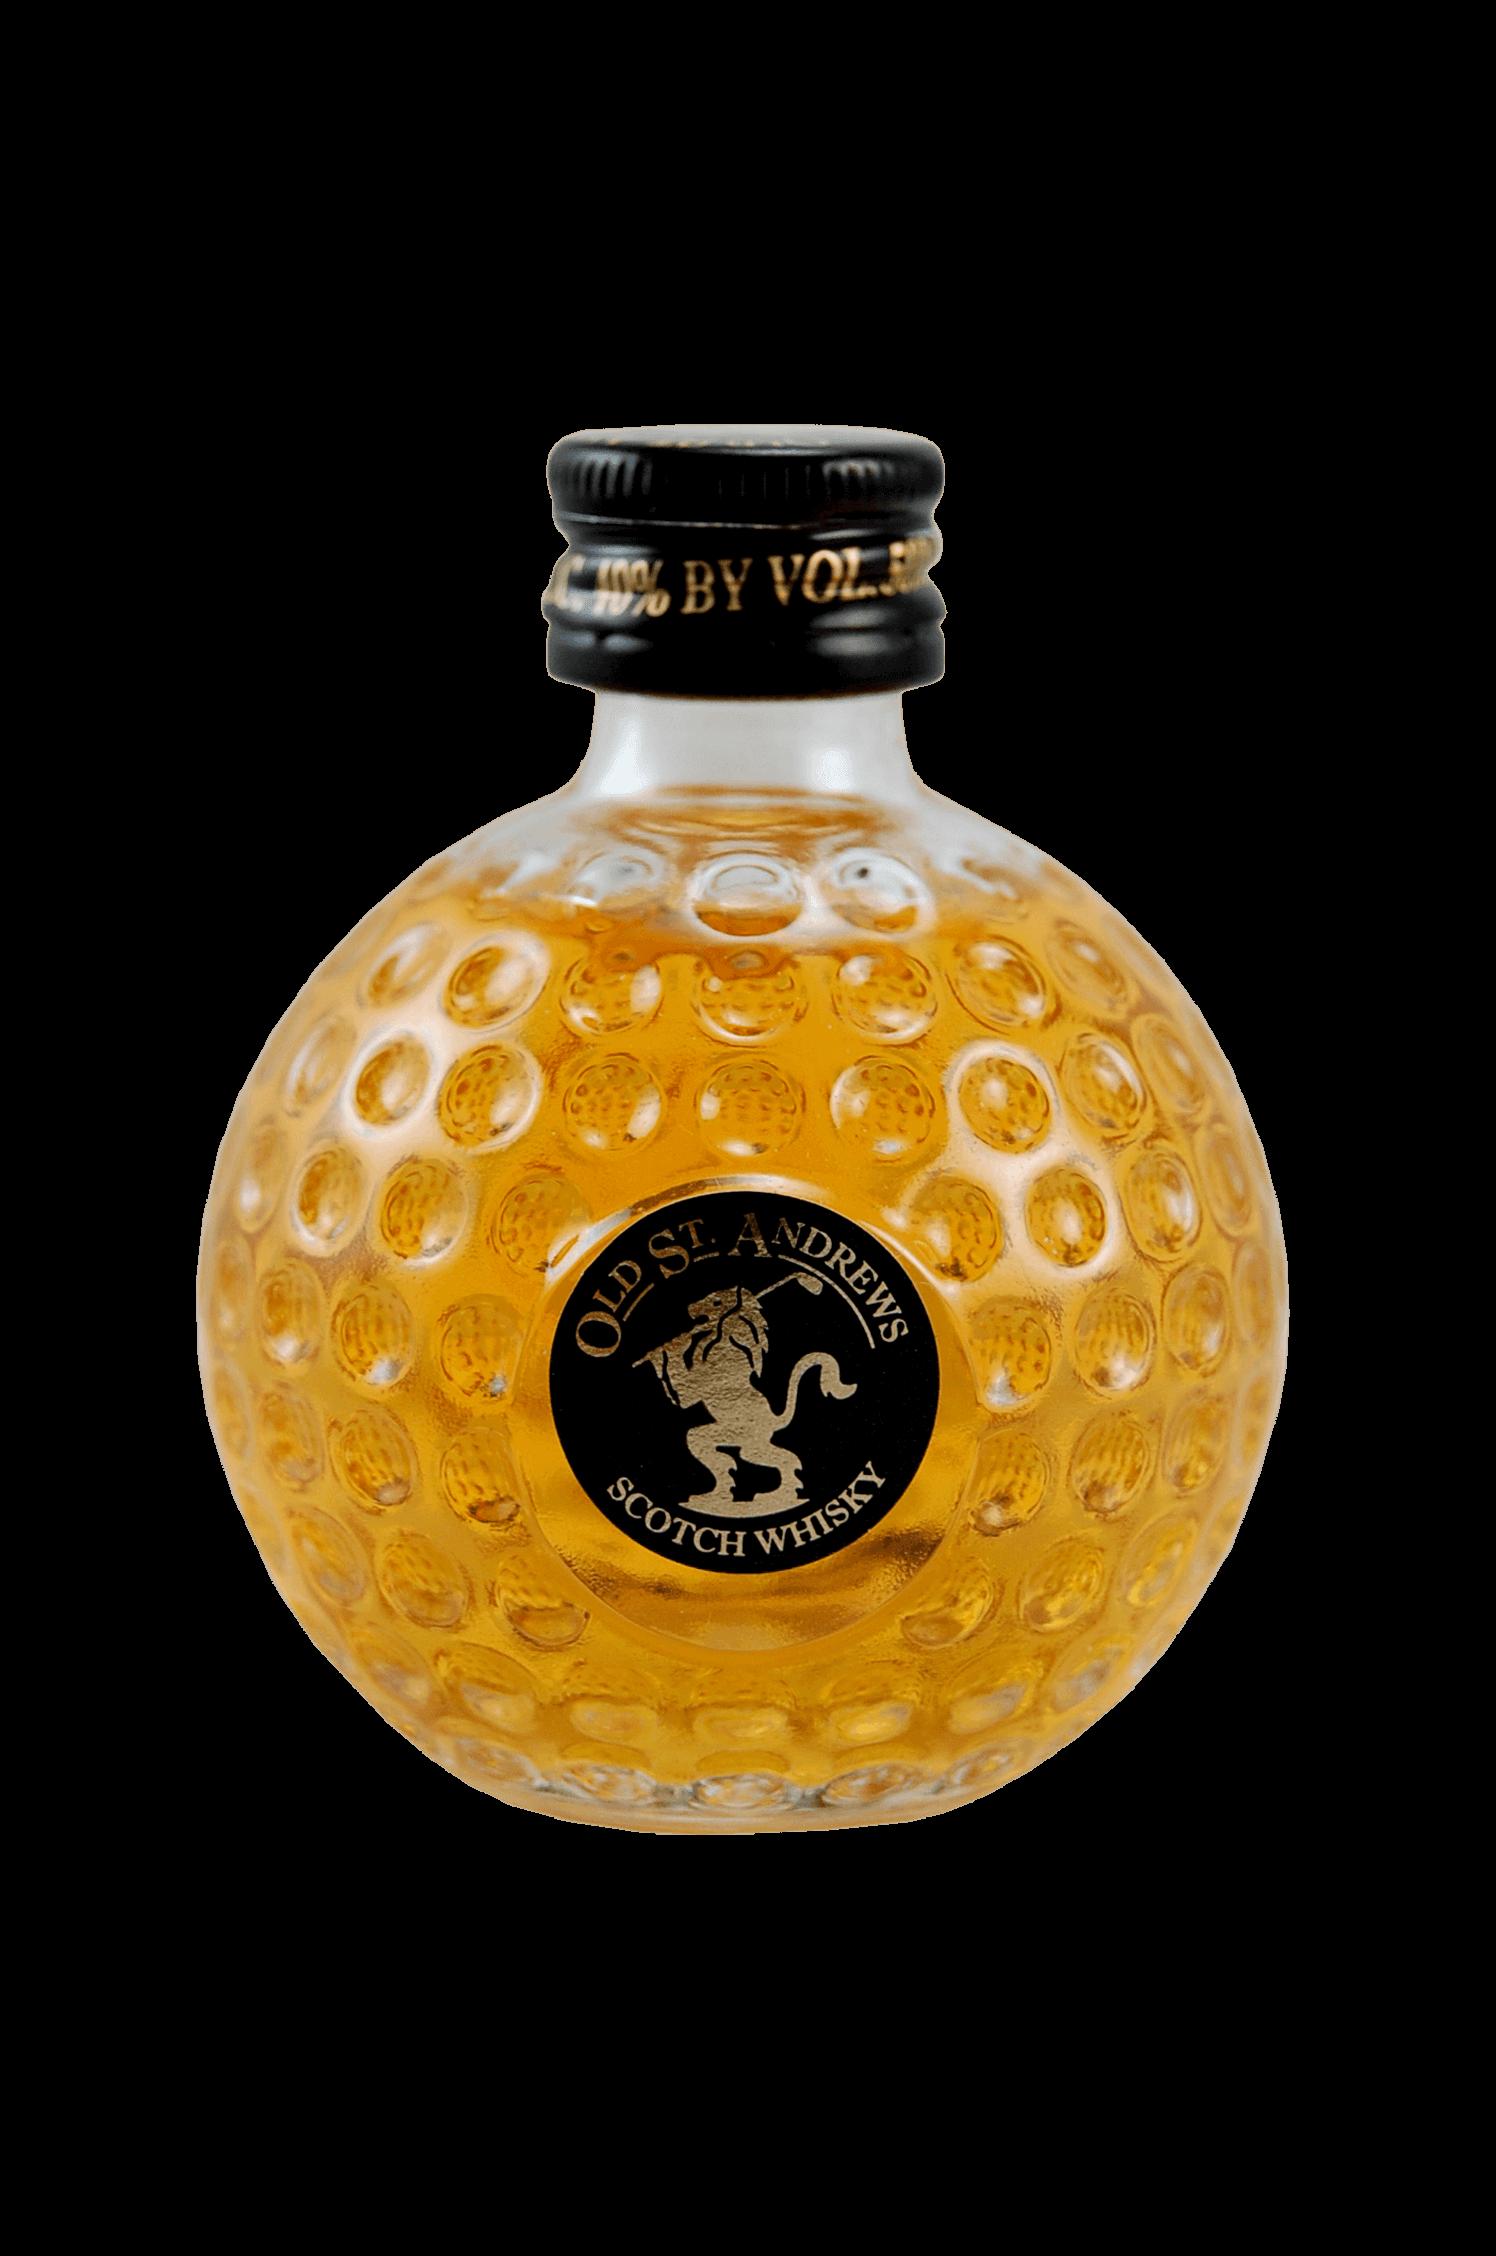 Old St. Andrews Whisky